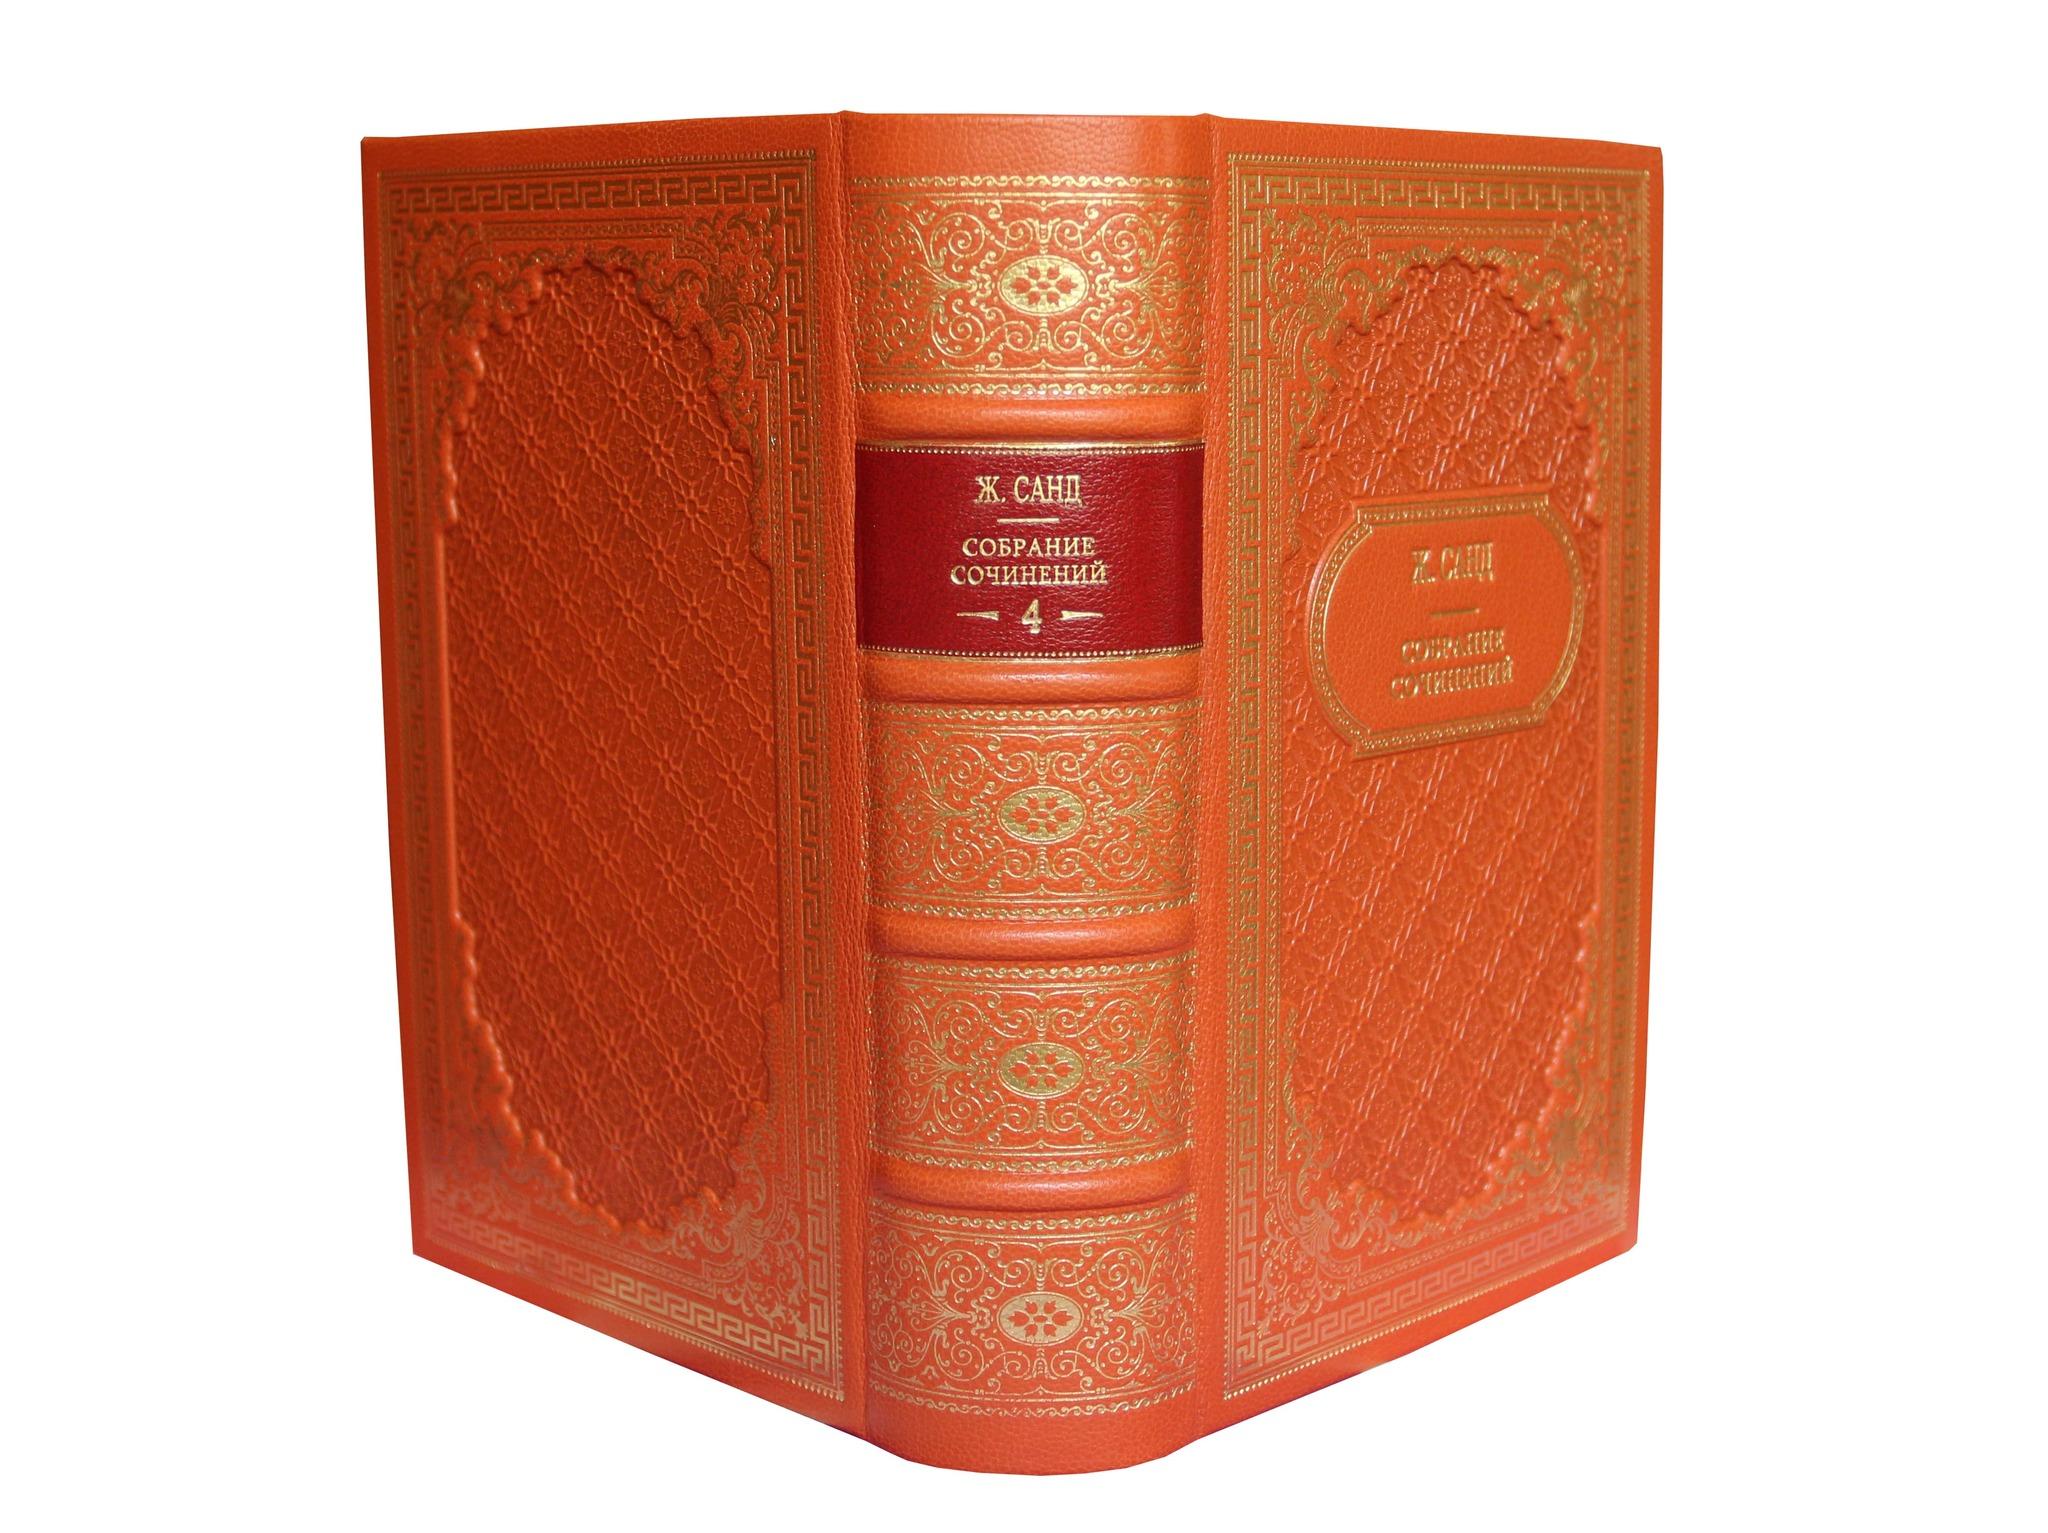 Санд Ж. Собрание сочинений в 10 томах